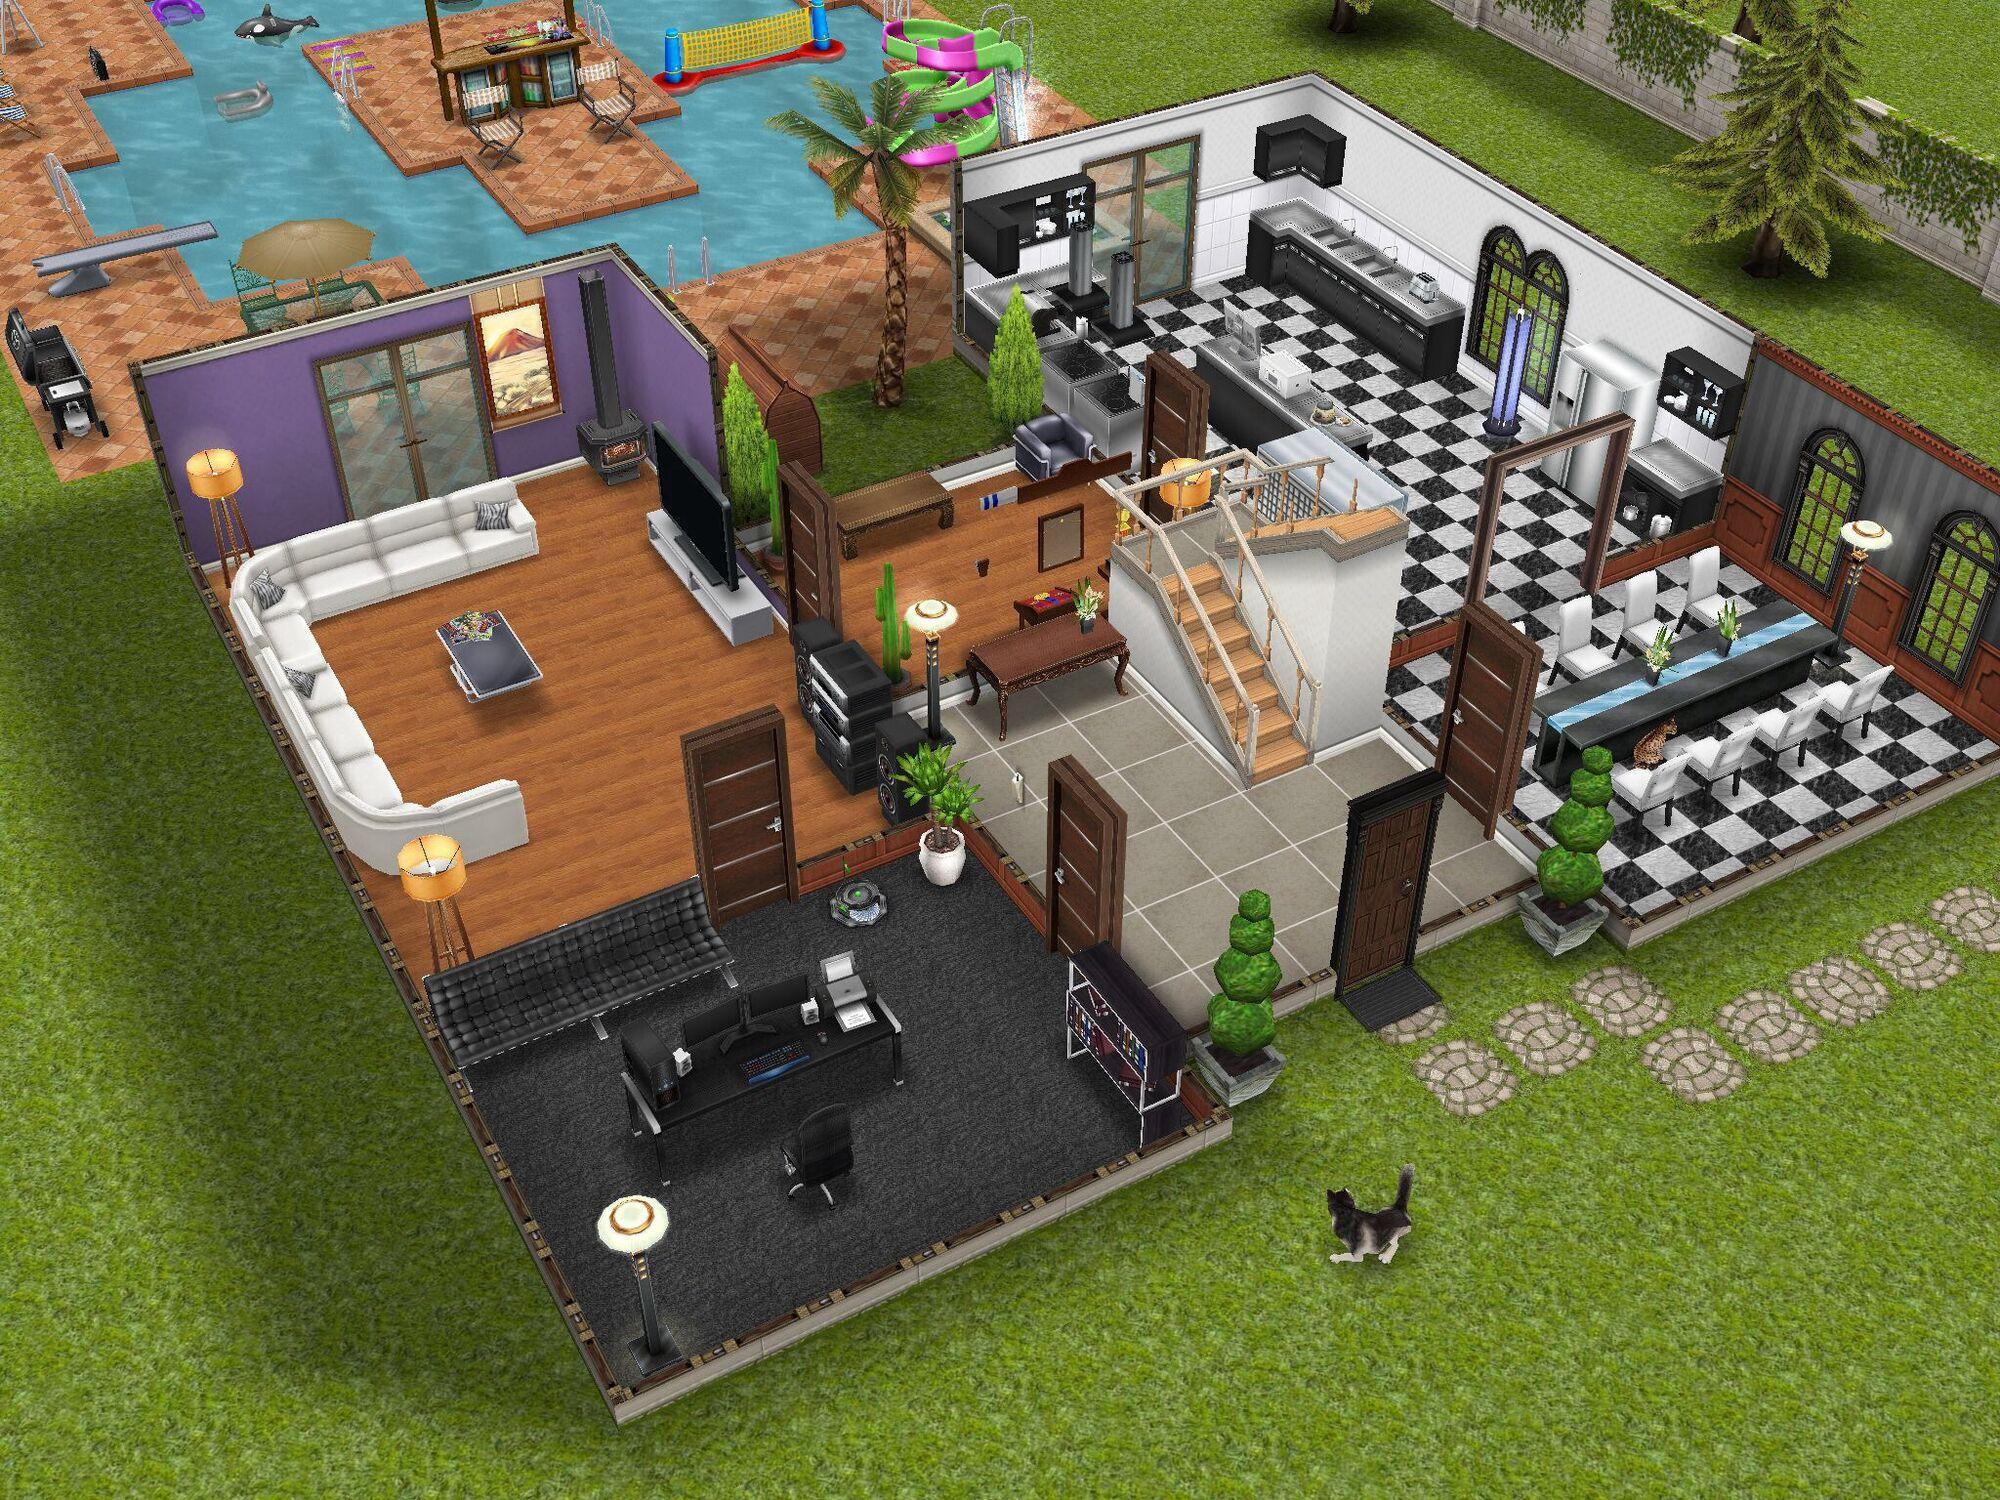 Emejing Designer Home Sims Freeplay Images Decorating House.